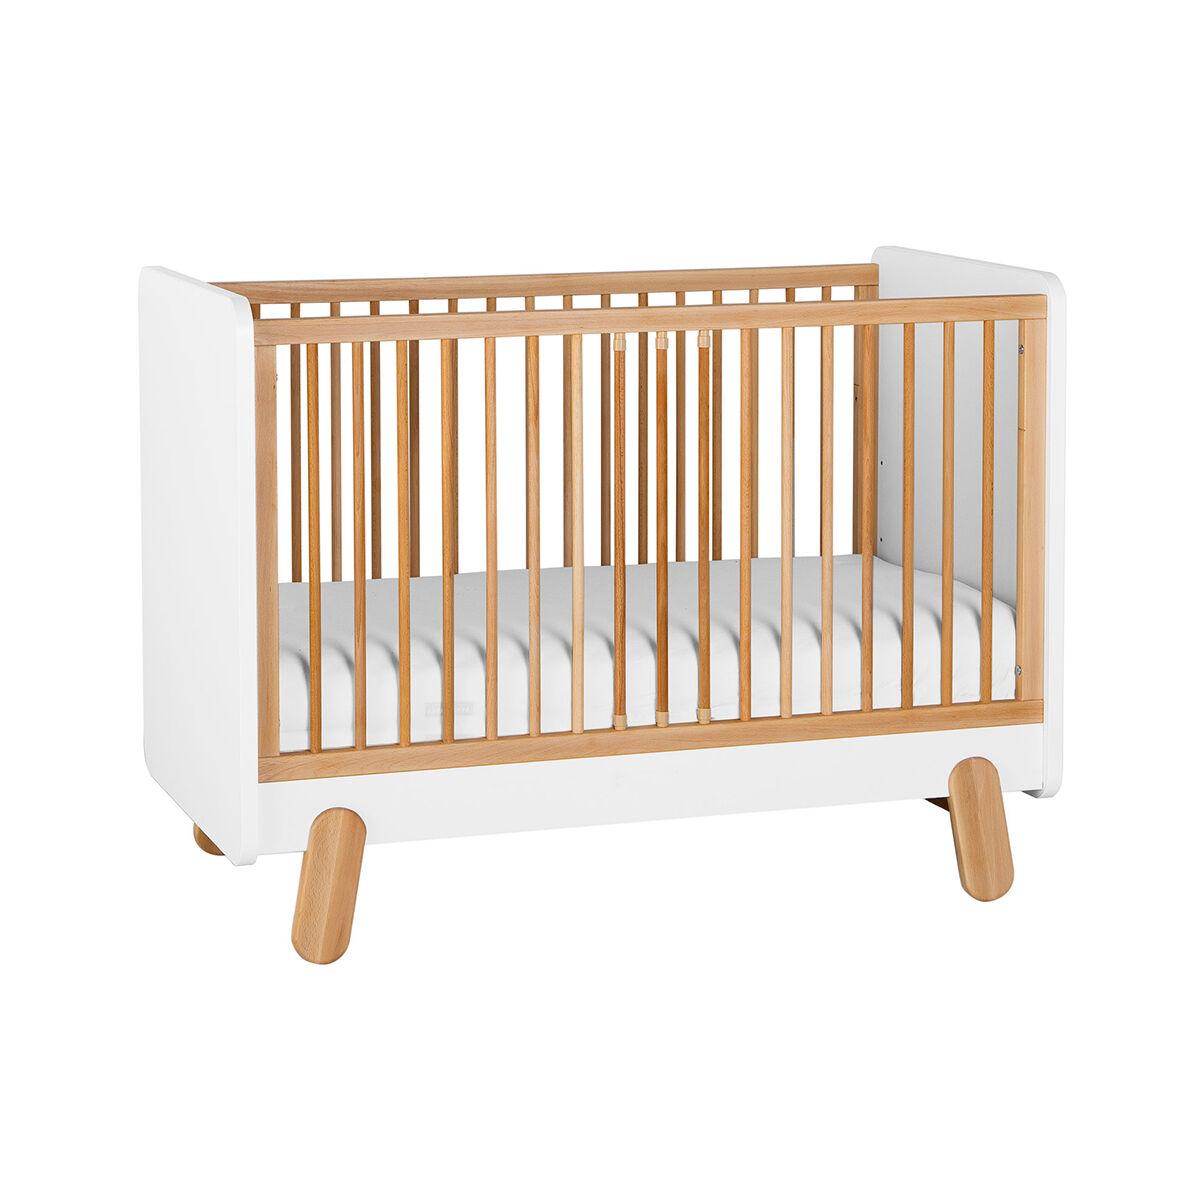 Pinio Lit bébé 60x120 blanc bois